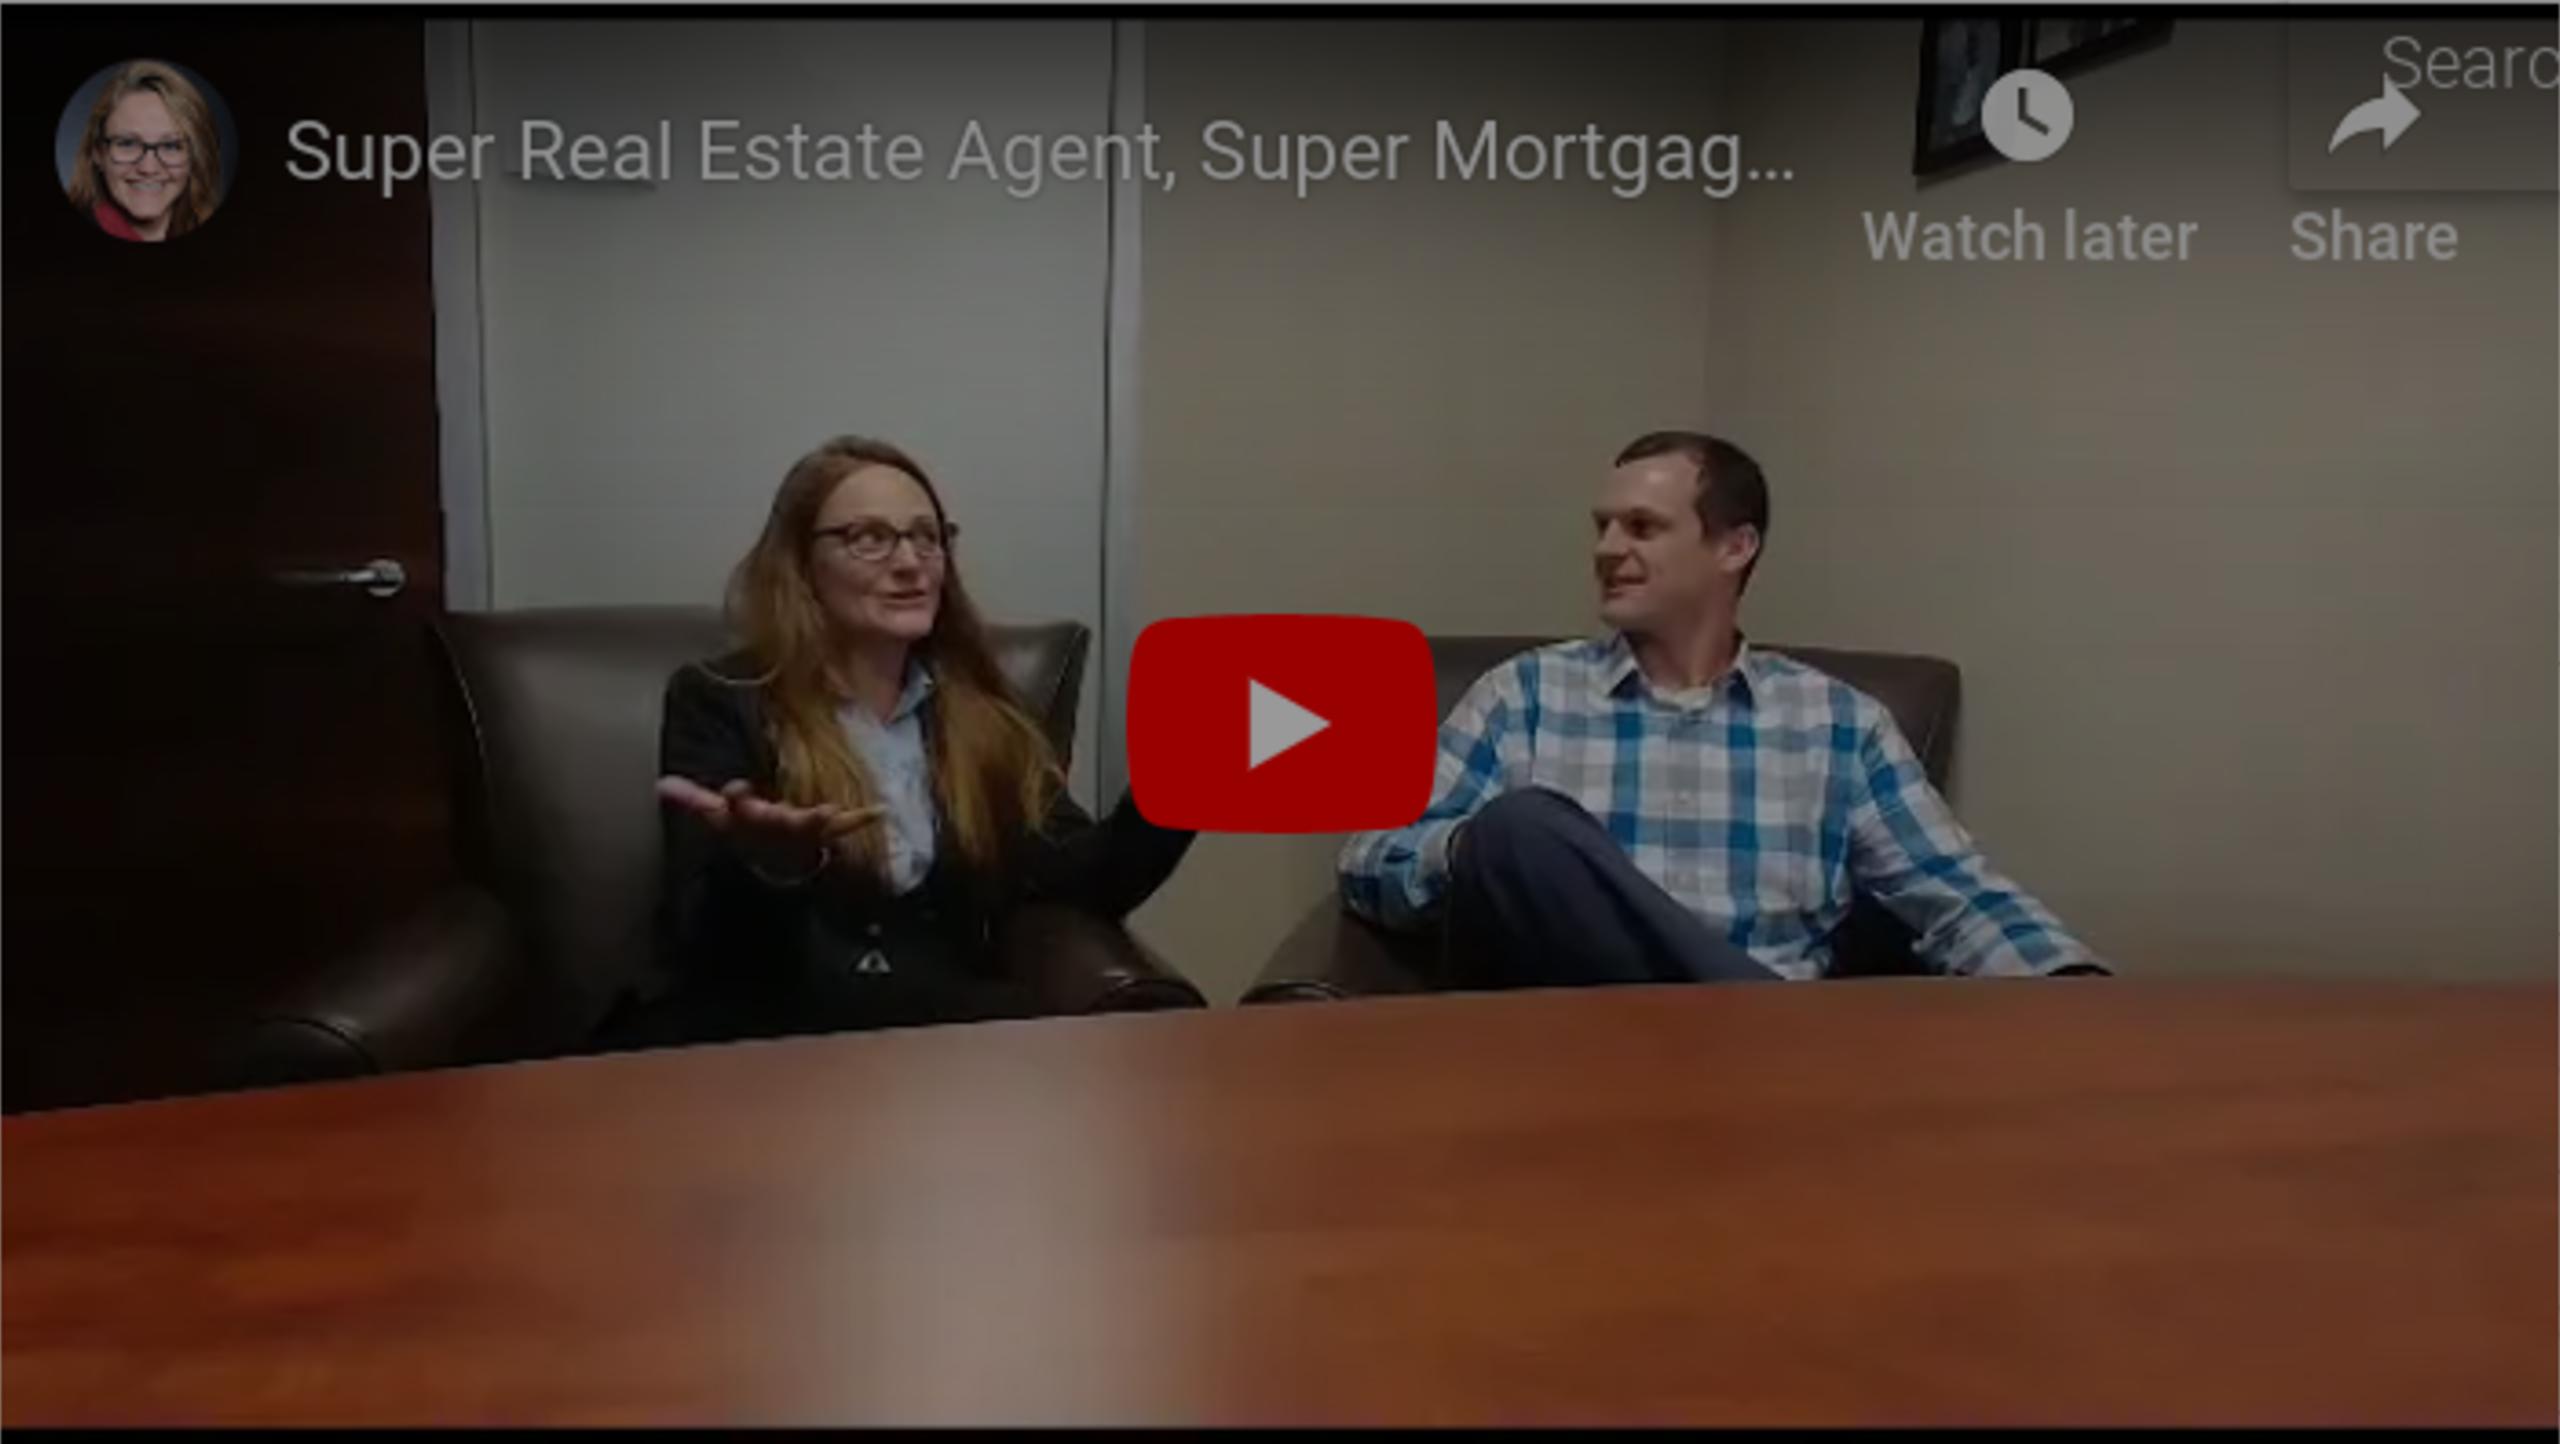 Super Real Estate Agent 2018